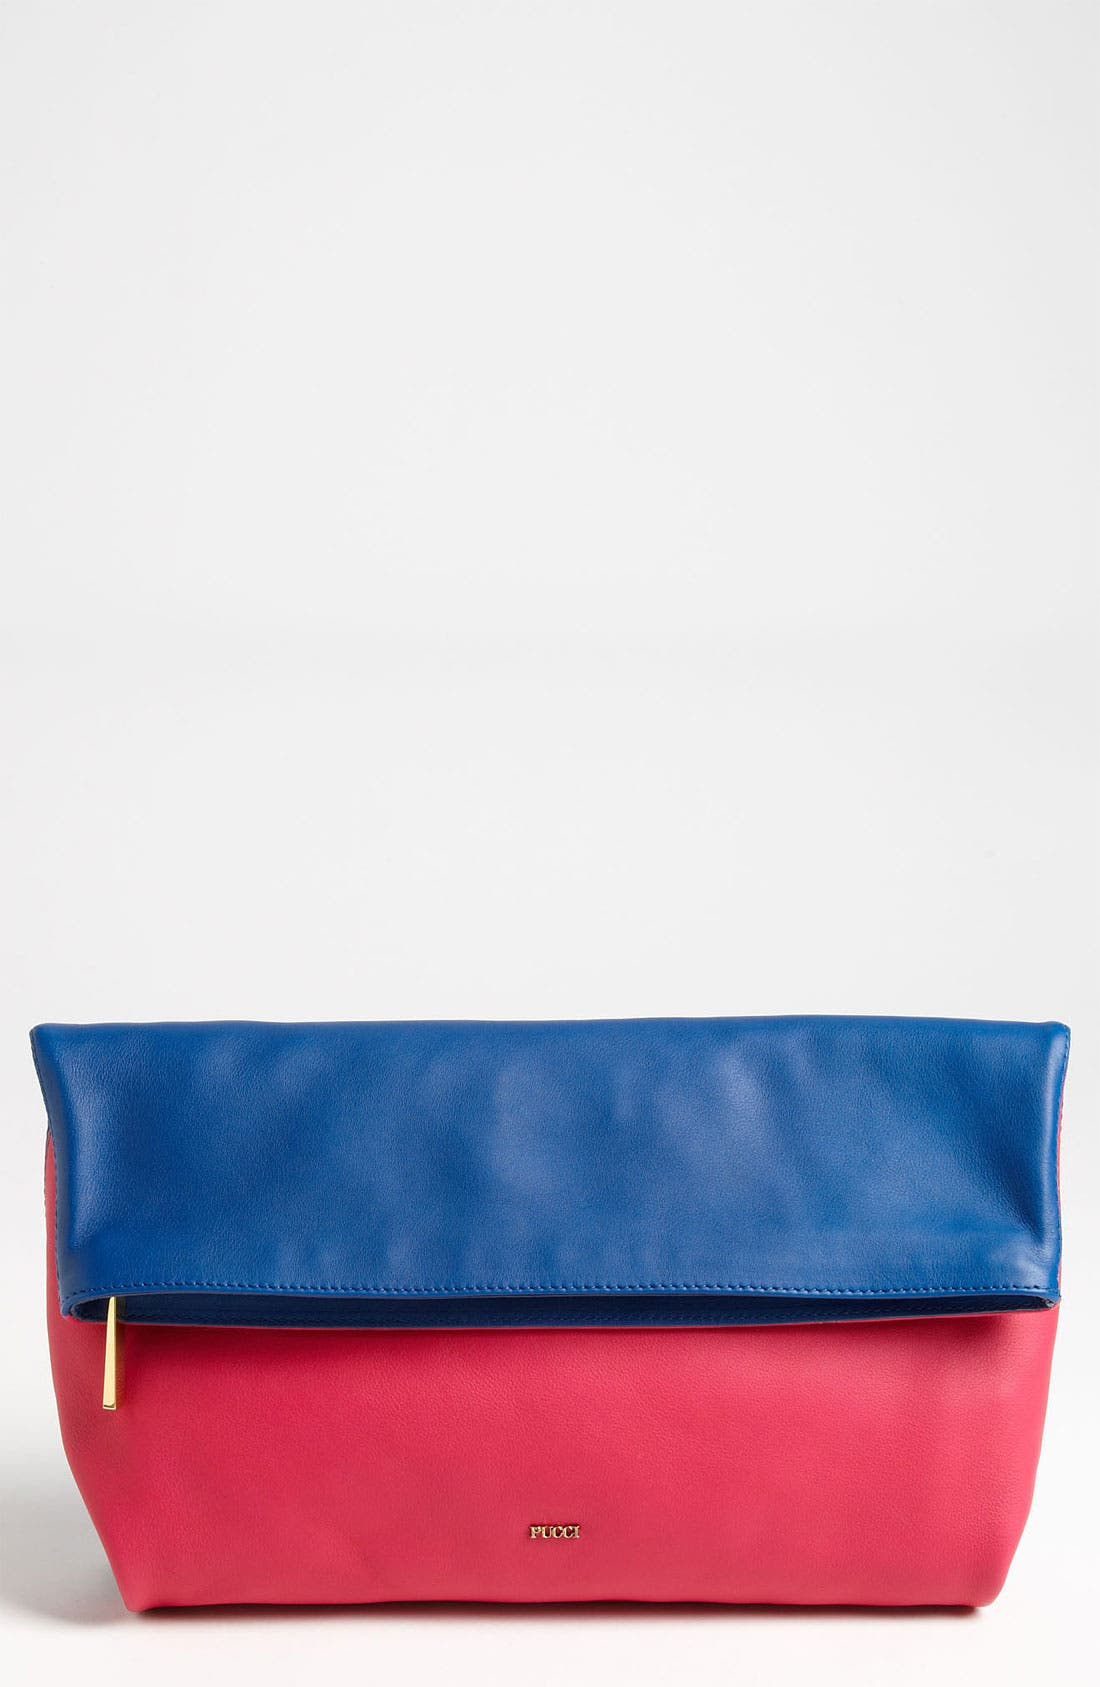 Main Image - Emilio Pucci 'Softy - Bicolor' Foldover Clutch